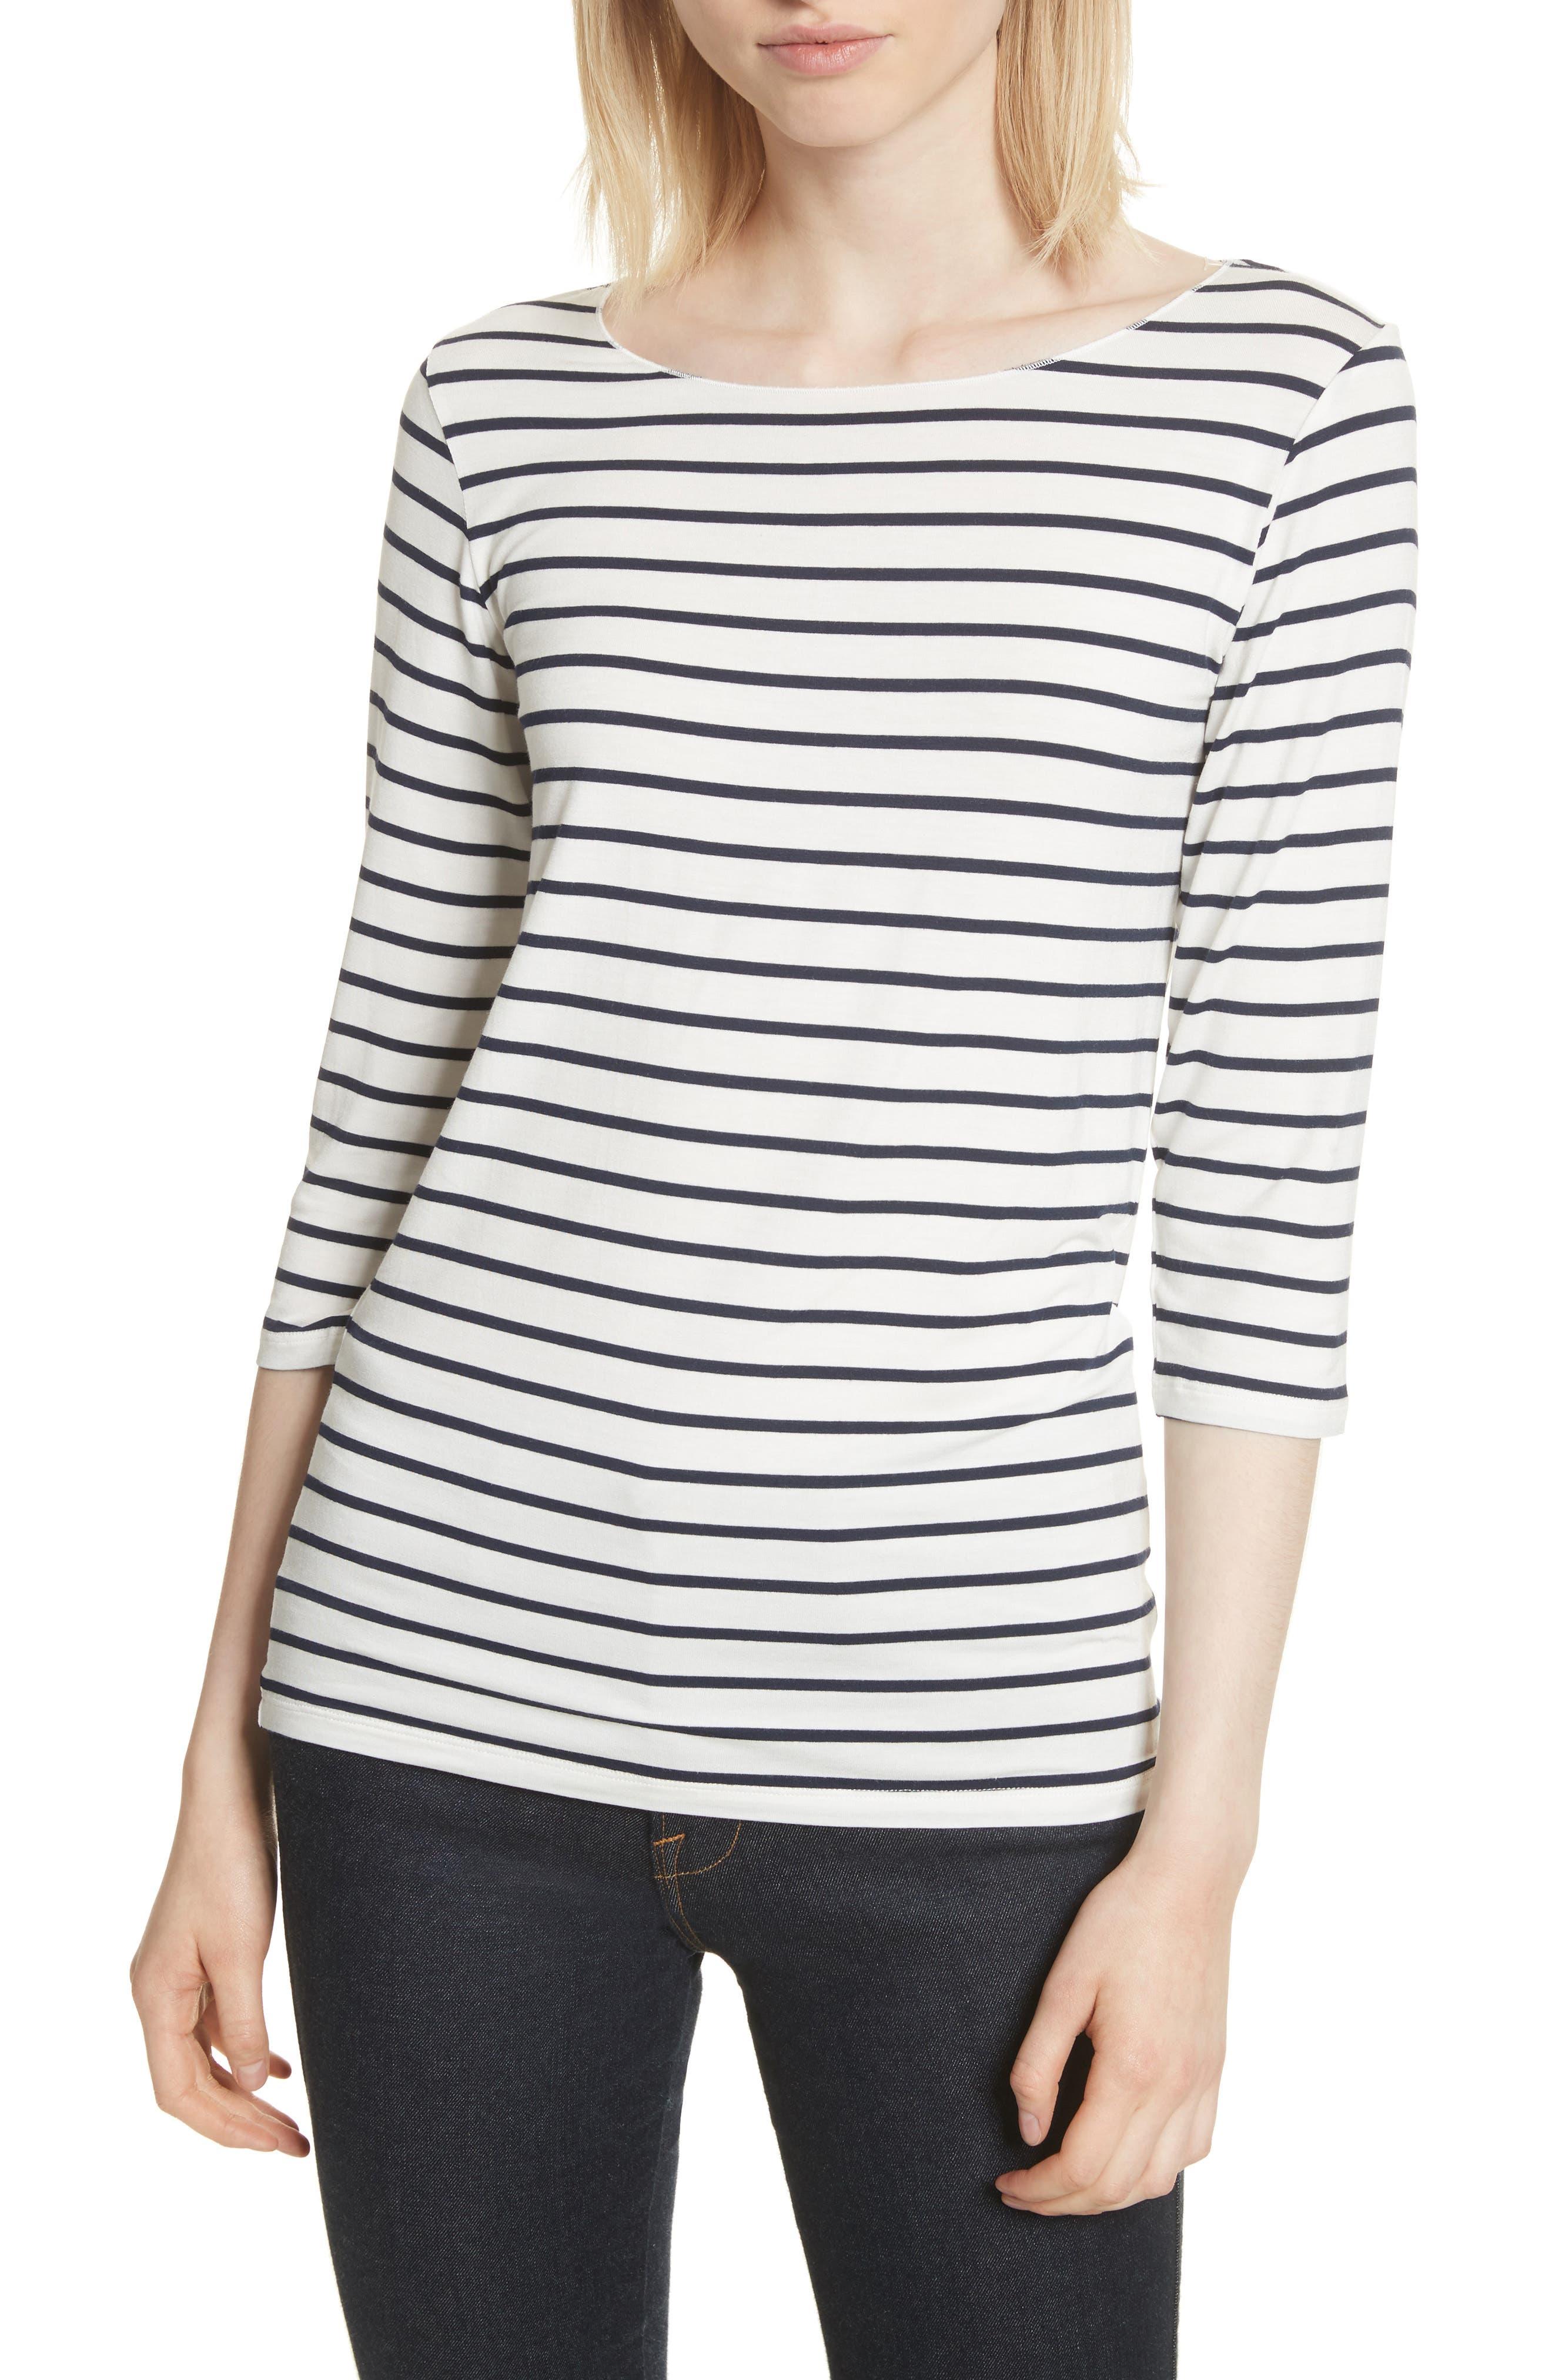 Alternate Image 1 Selected - Majestic Filatures Stripe Boat Neck Shirt